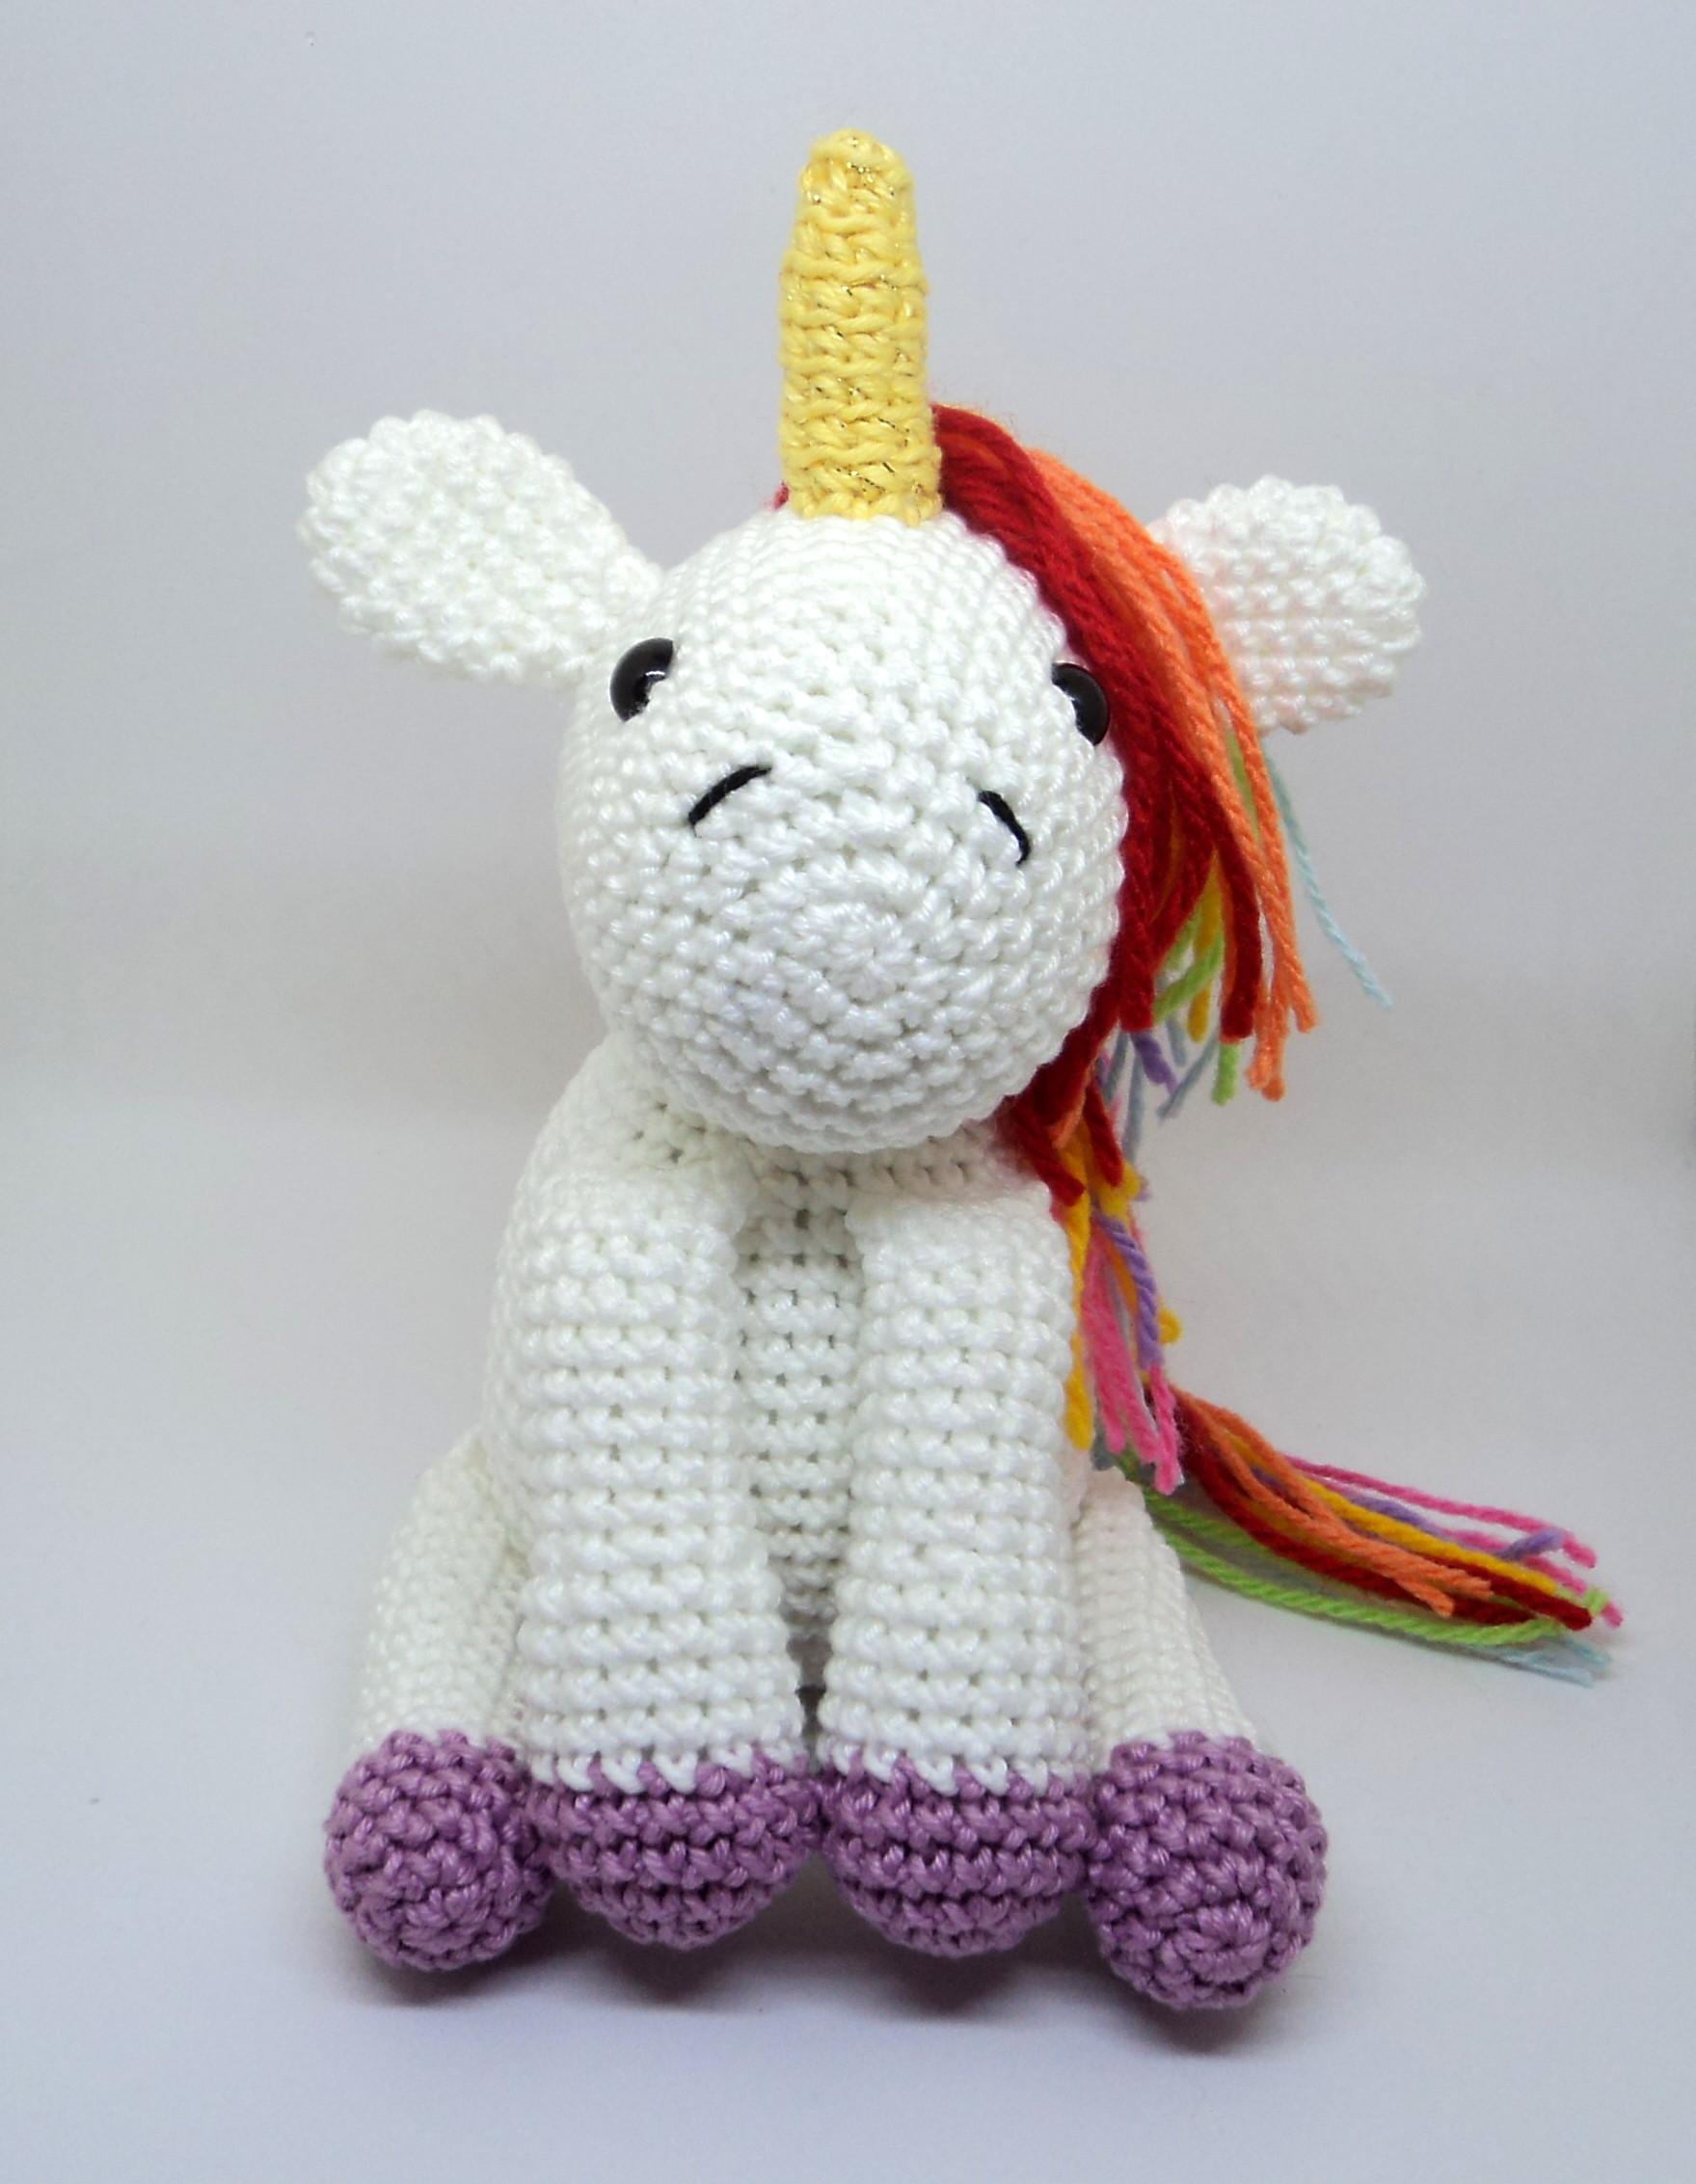 Amigurumi unicornio | Amigurumi unicornio, Amigurumis unicornio ... | 2265x1759